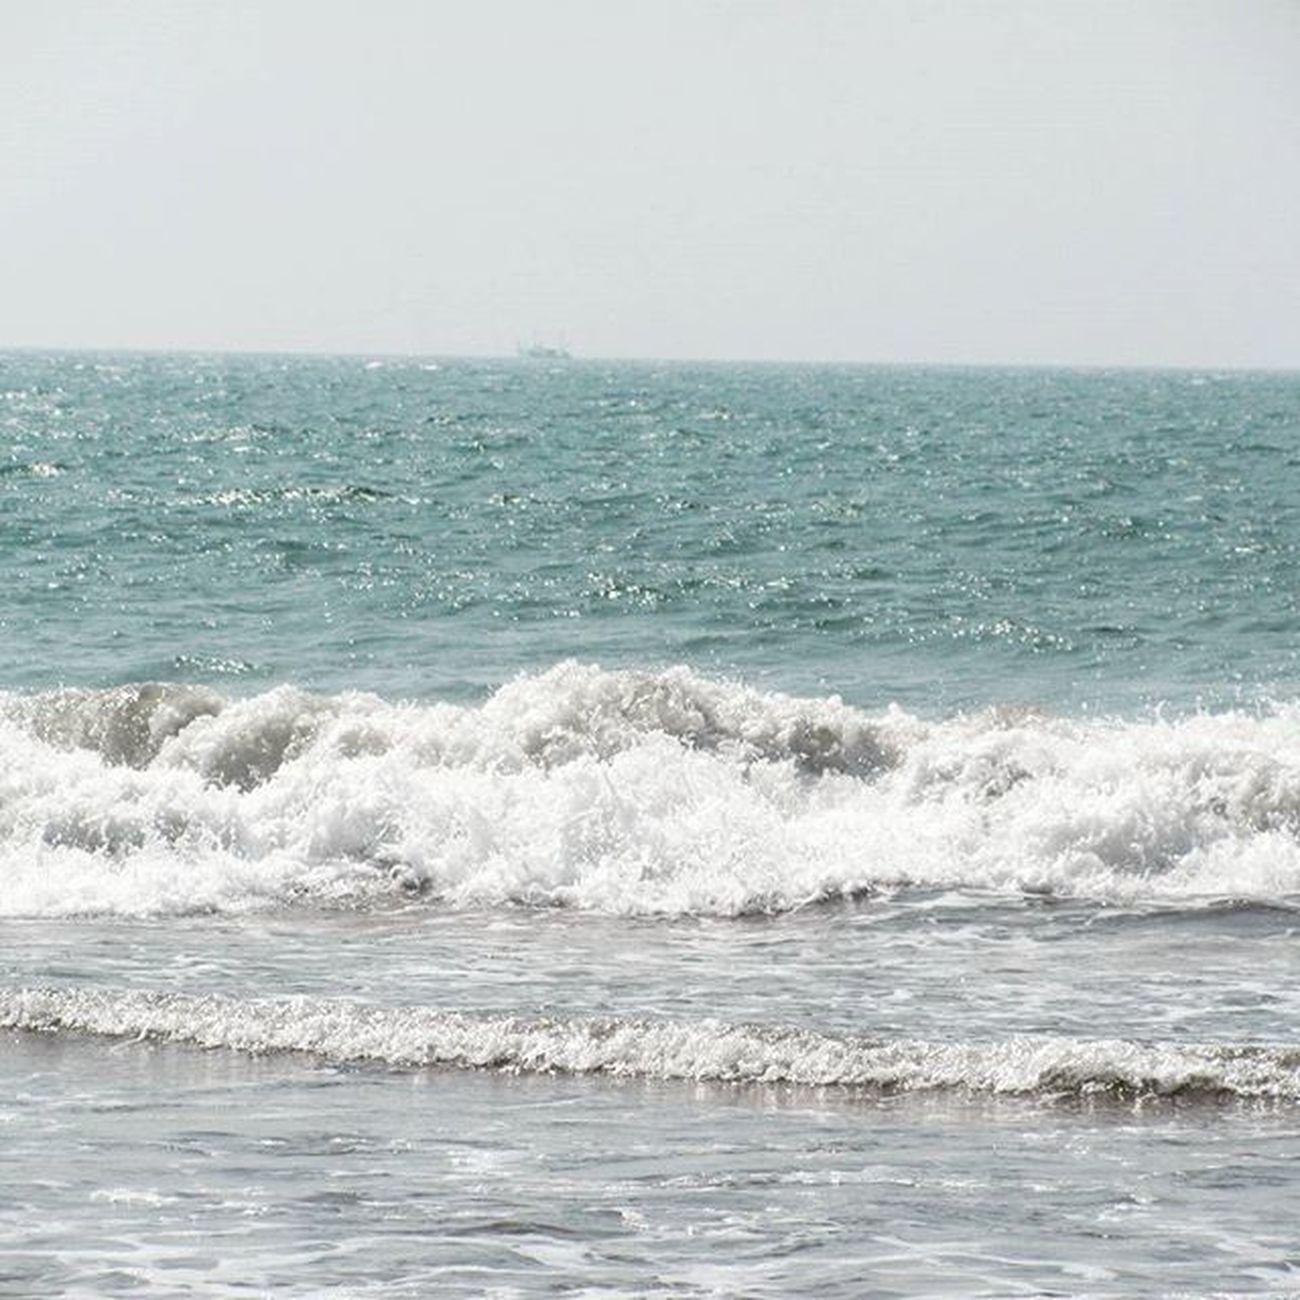 Morgim Beachinindia Beach Swimming Family Friends Fun Weekends Holiday Goa Goatrip Traveldiary Travel Photography Saumendas Dassaumen Saumen Das Sdas Dass Sid Wave Water